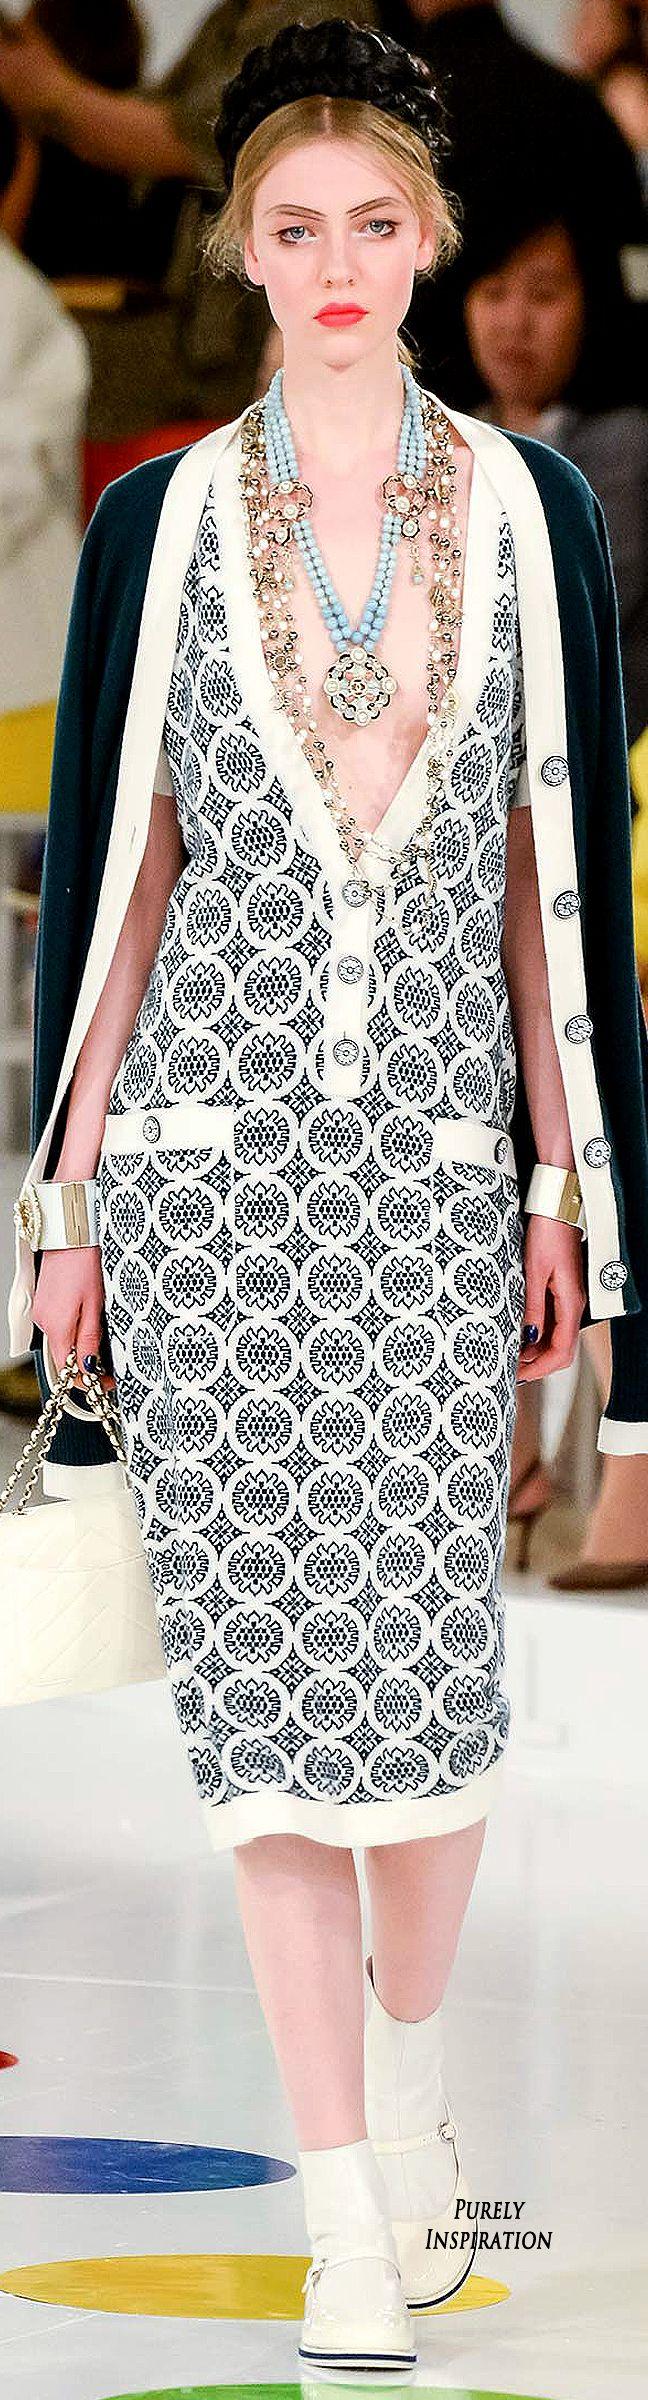 Chanel Resort 2016 Women's Fashion RTW | Purely Inspiration